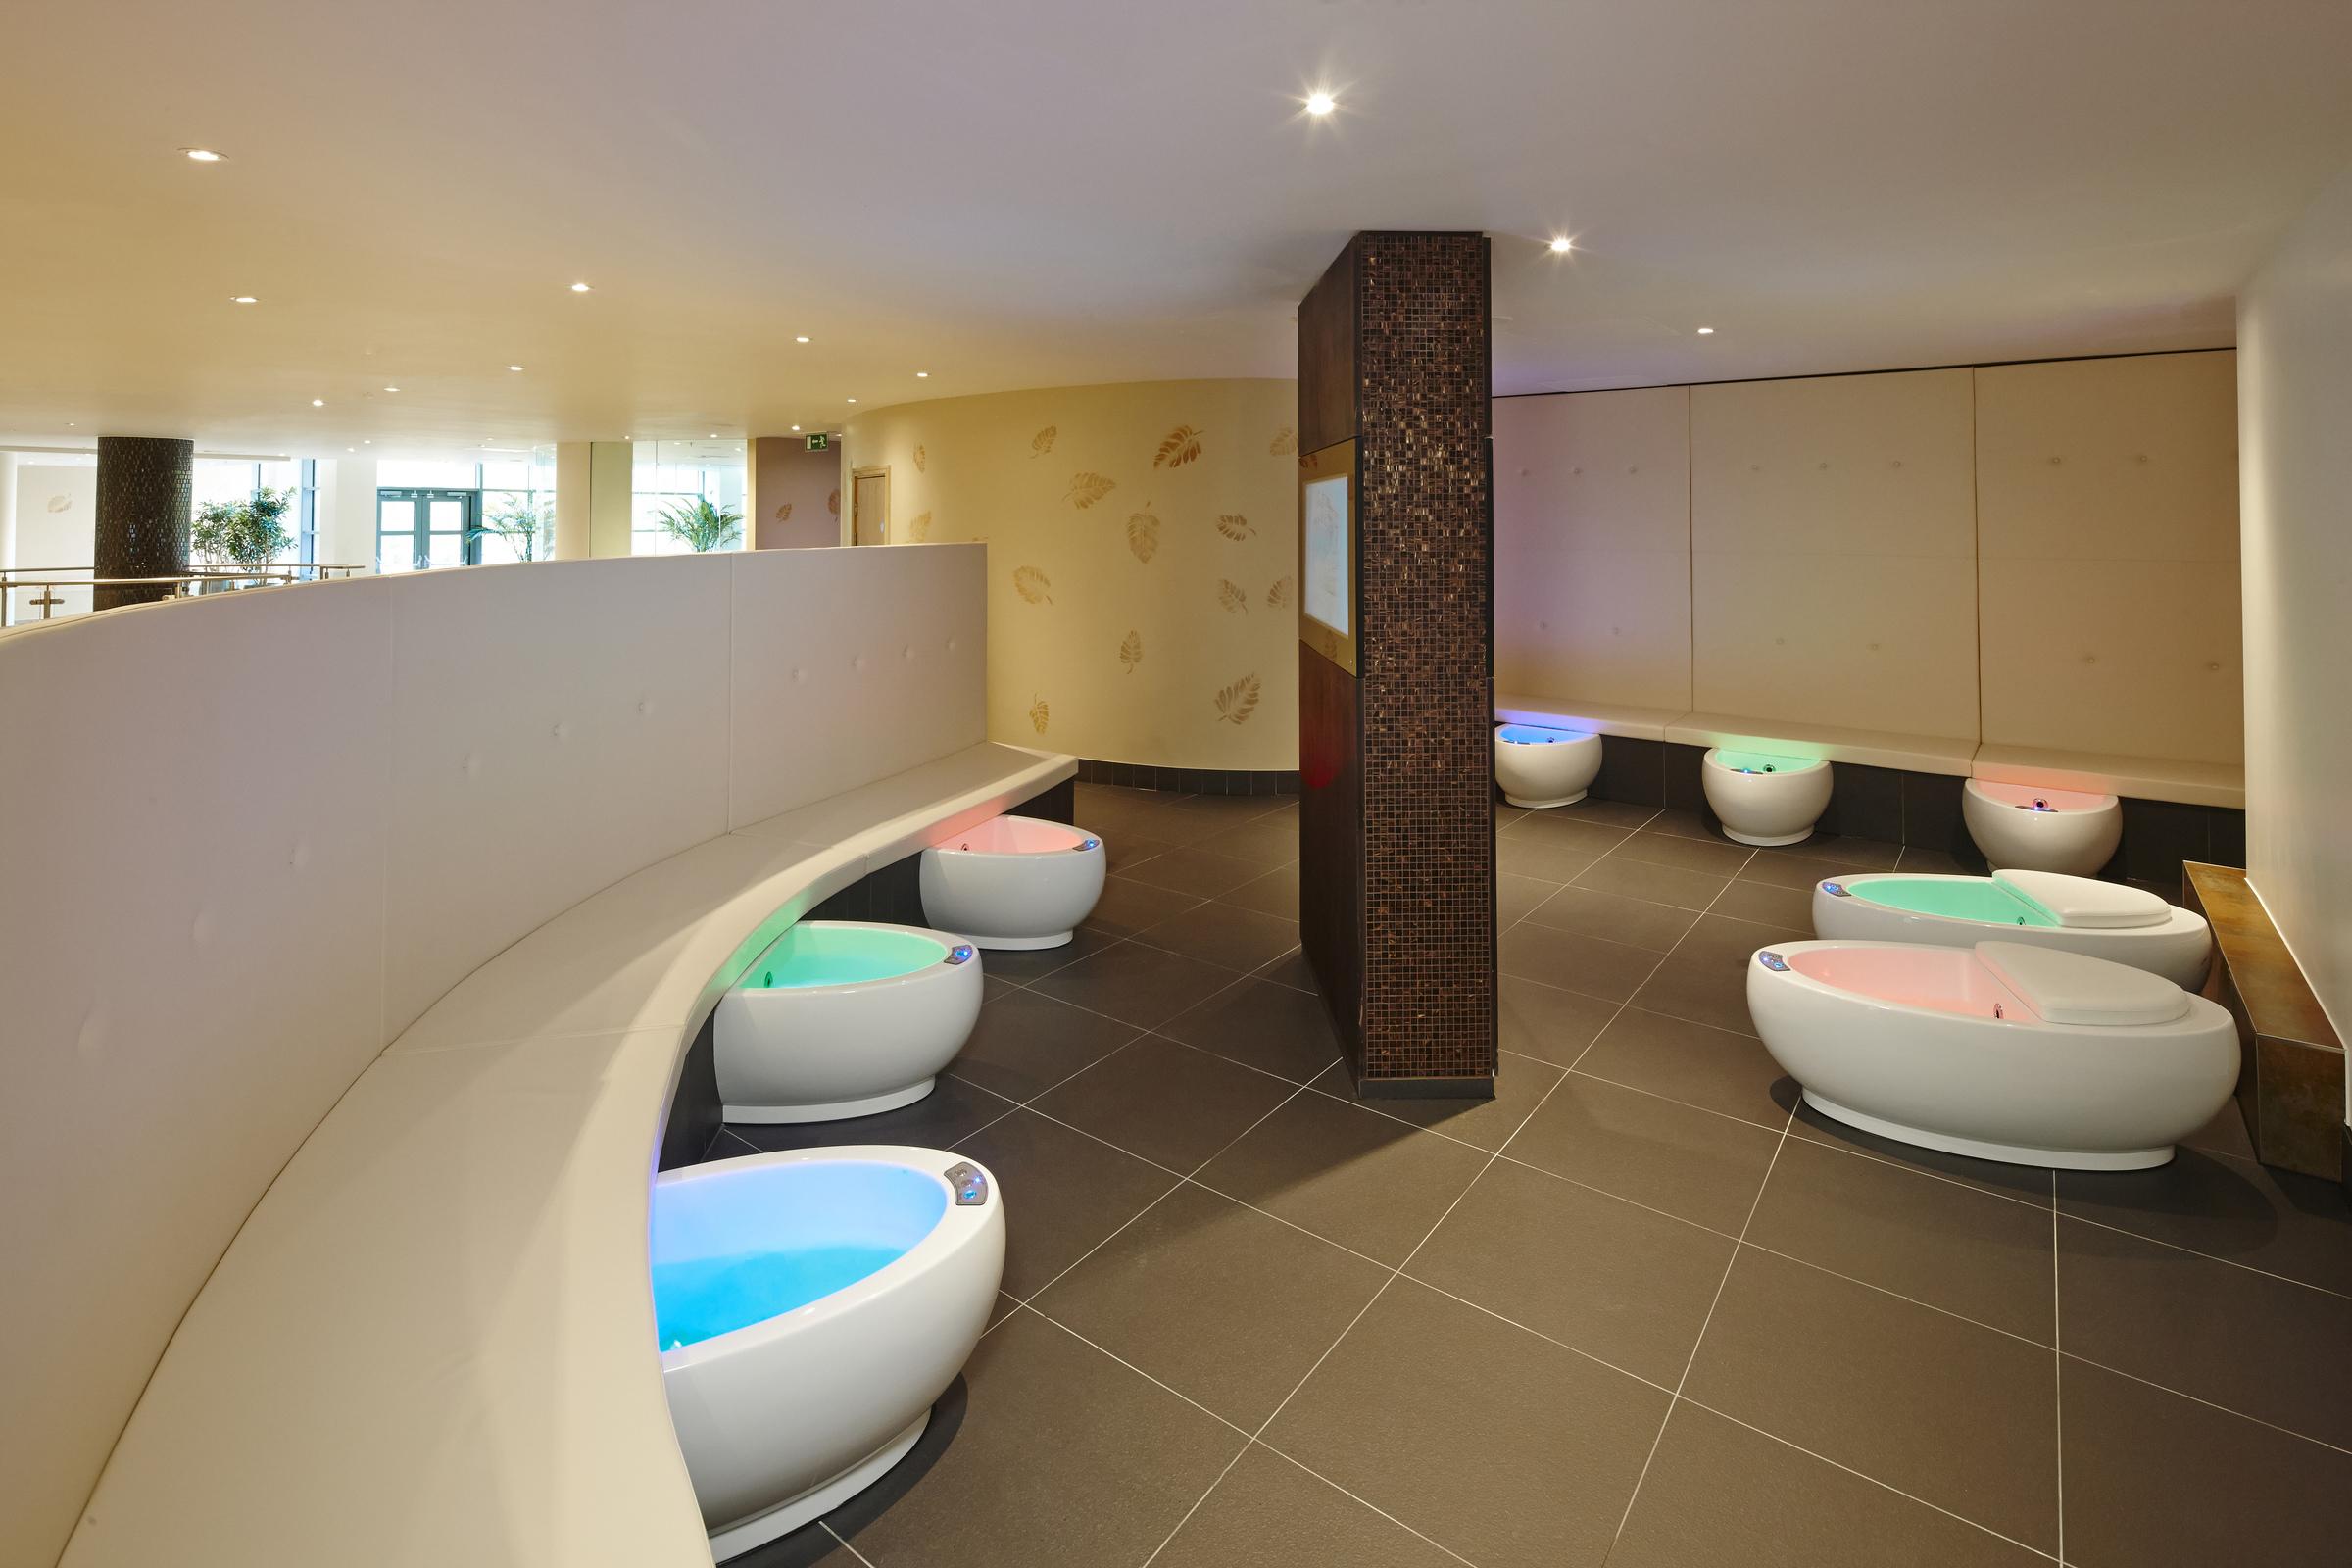 Reflexology Foot Baths